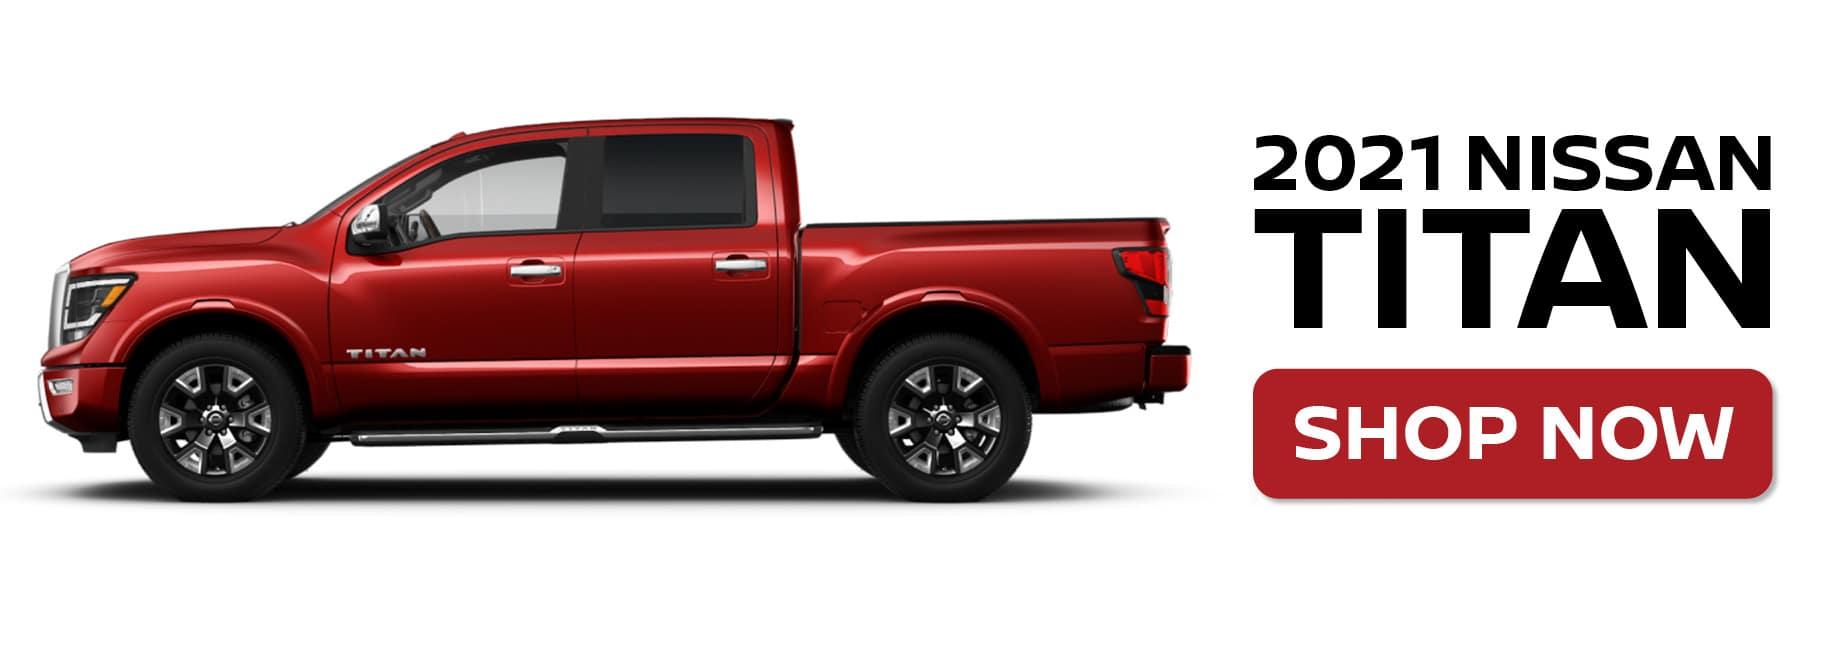 Nissan Titan For Sale In Katy, TX